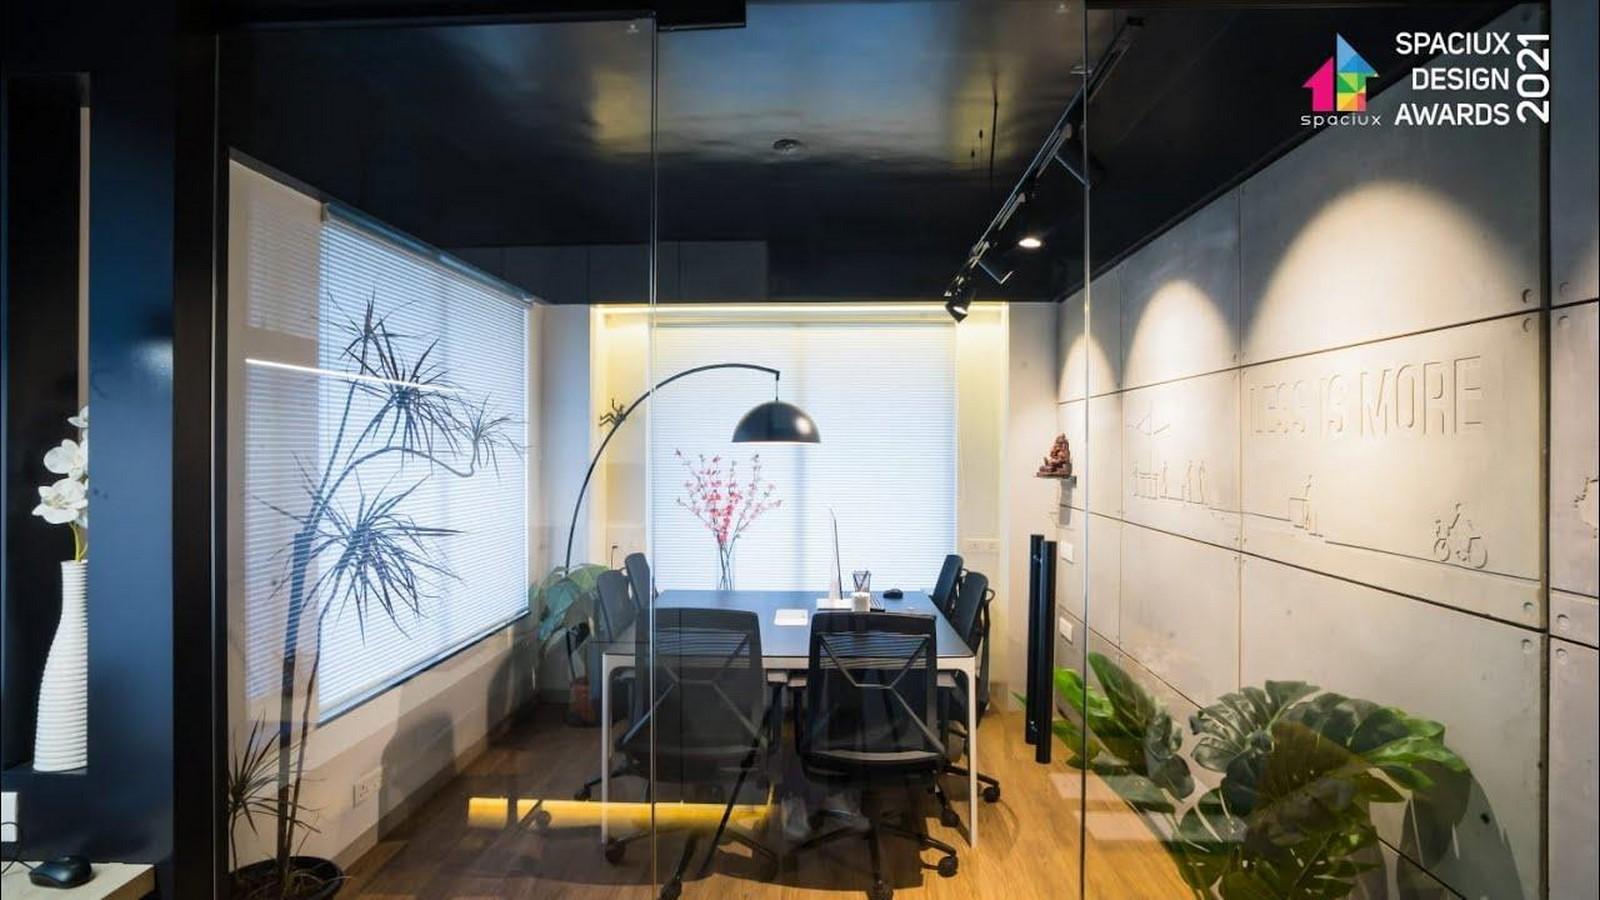 Minal Dubey: Entrepreneurship and Architecture - Sheet3